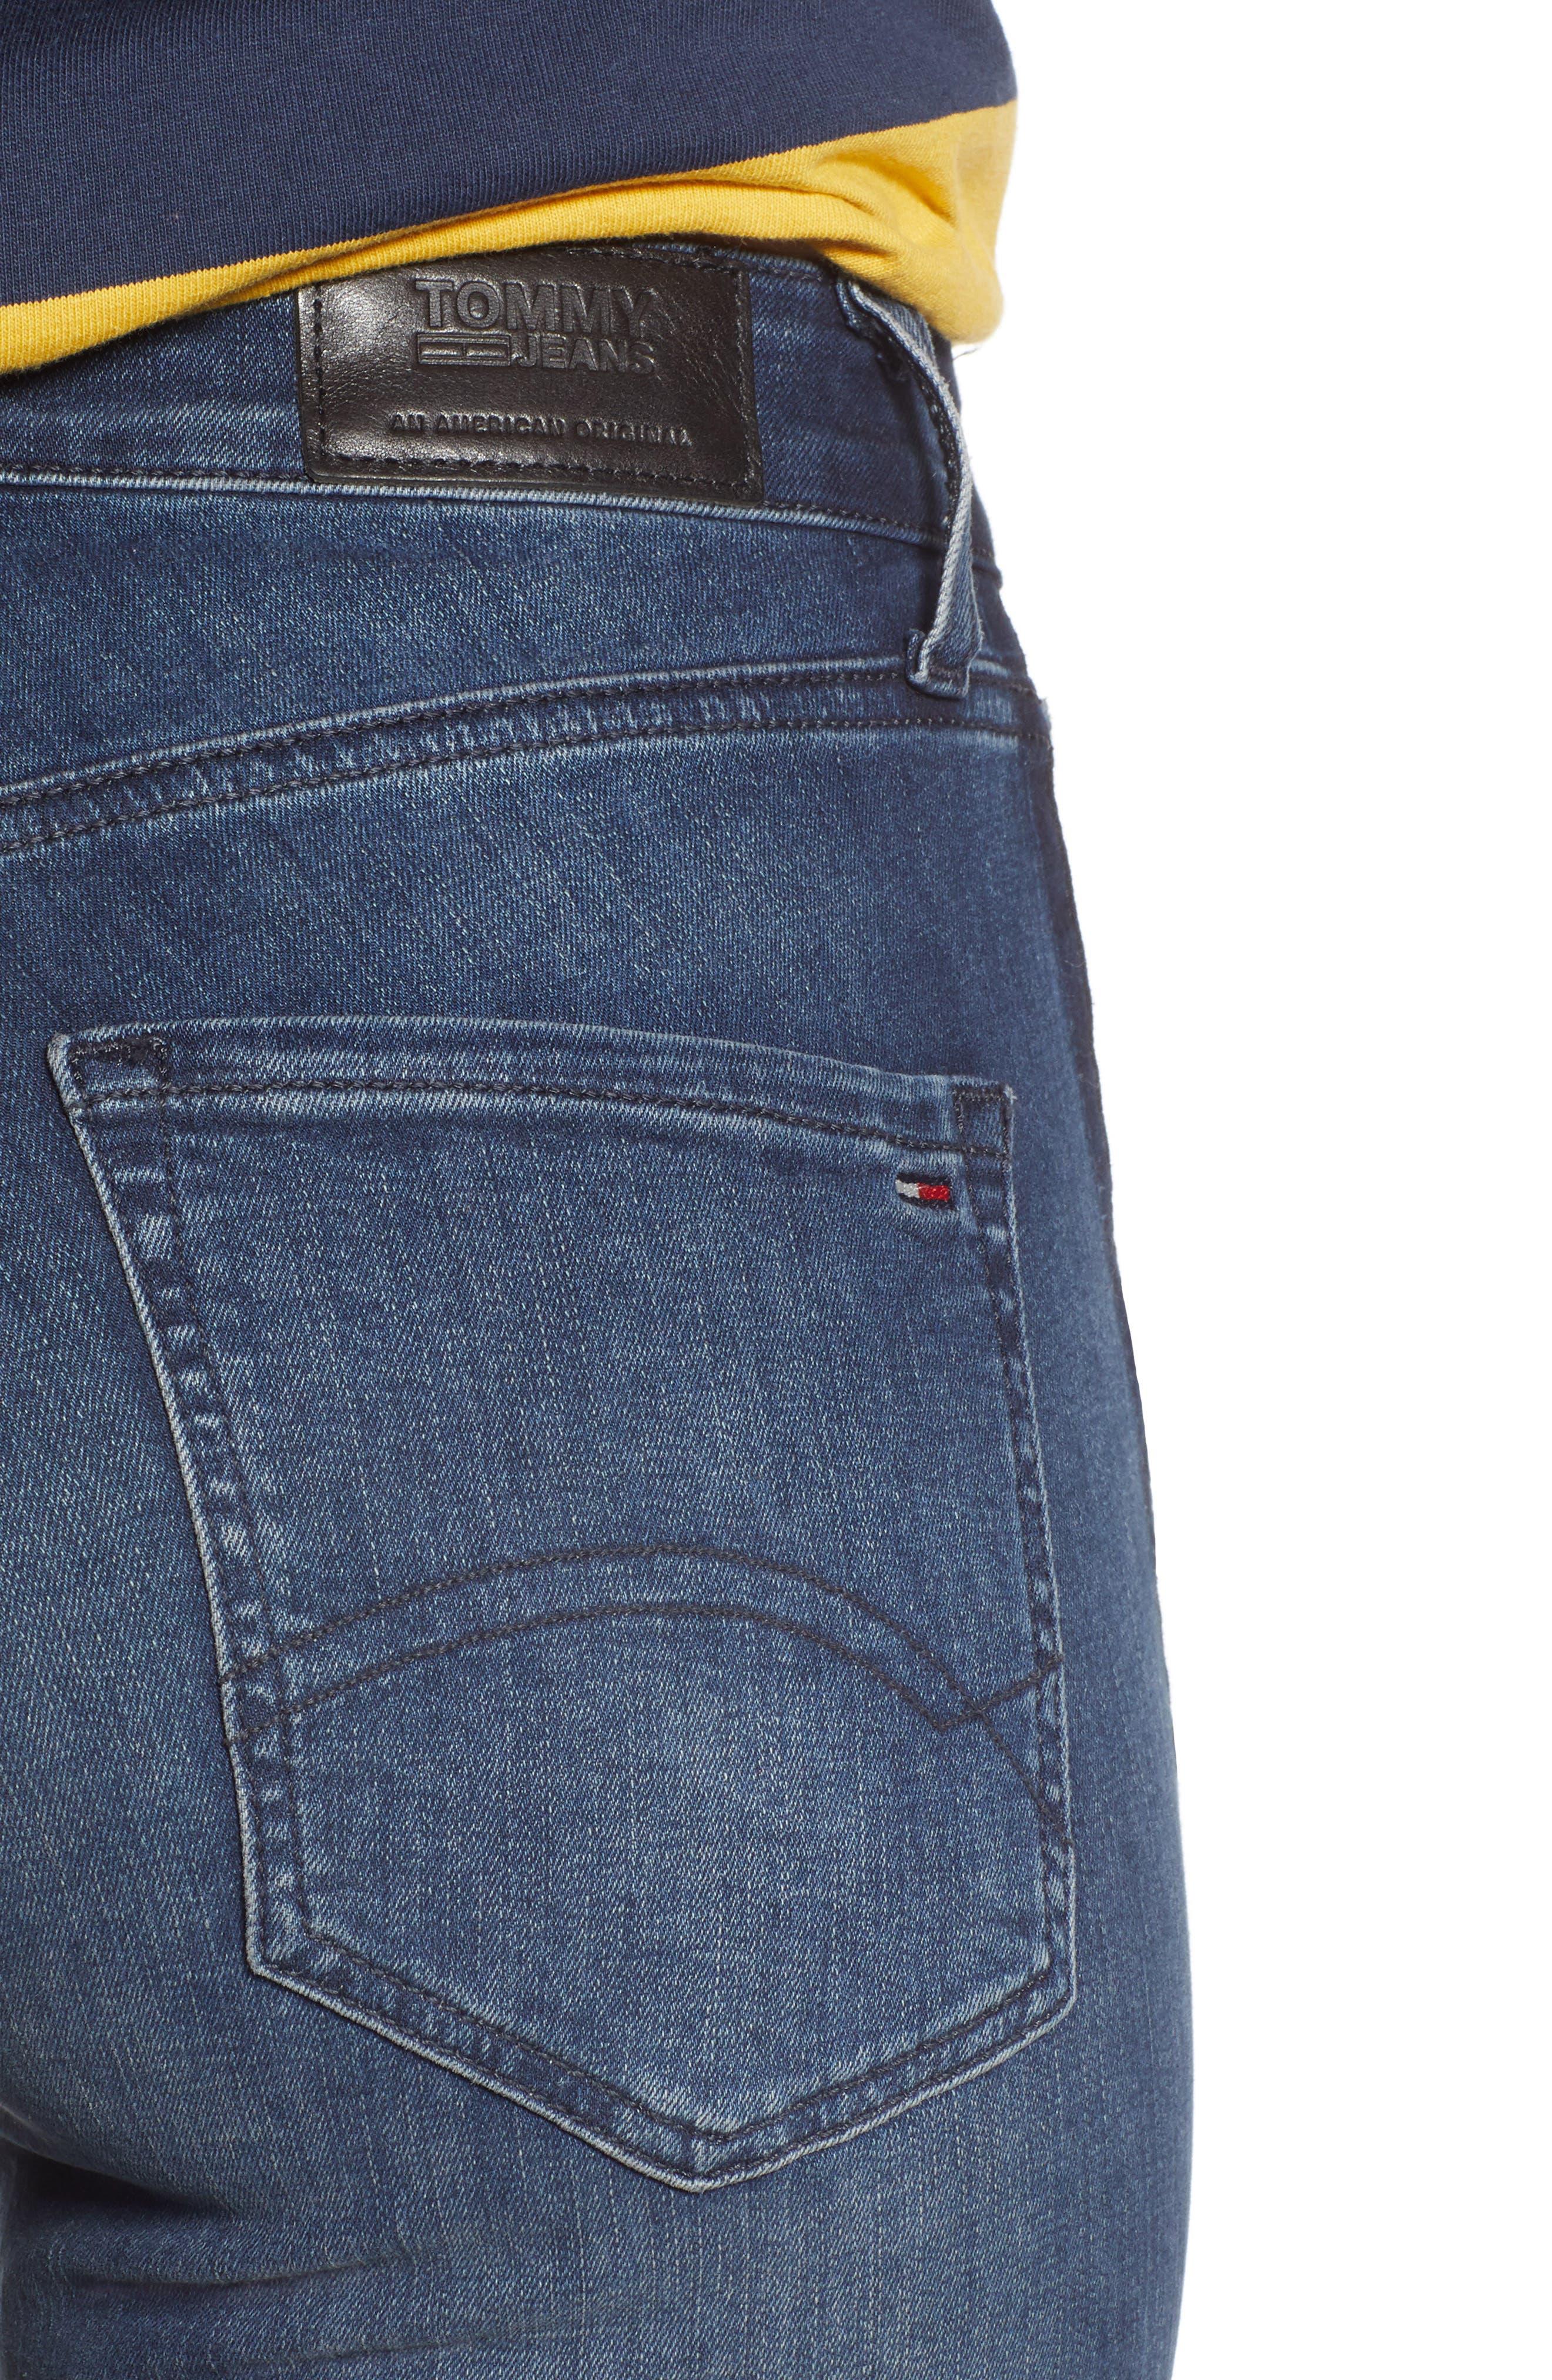 Santana High Waist Skinny Jeans,                             Alternate thumbnail 4, color,                             NEDDLE DARK BLUE STRETCH